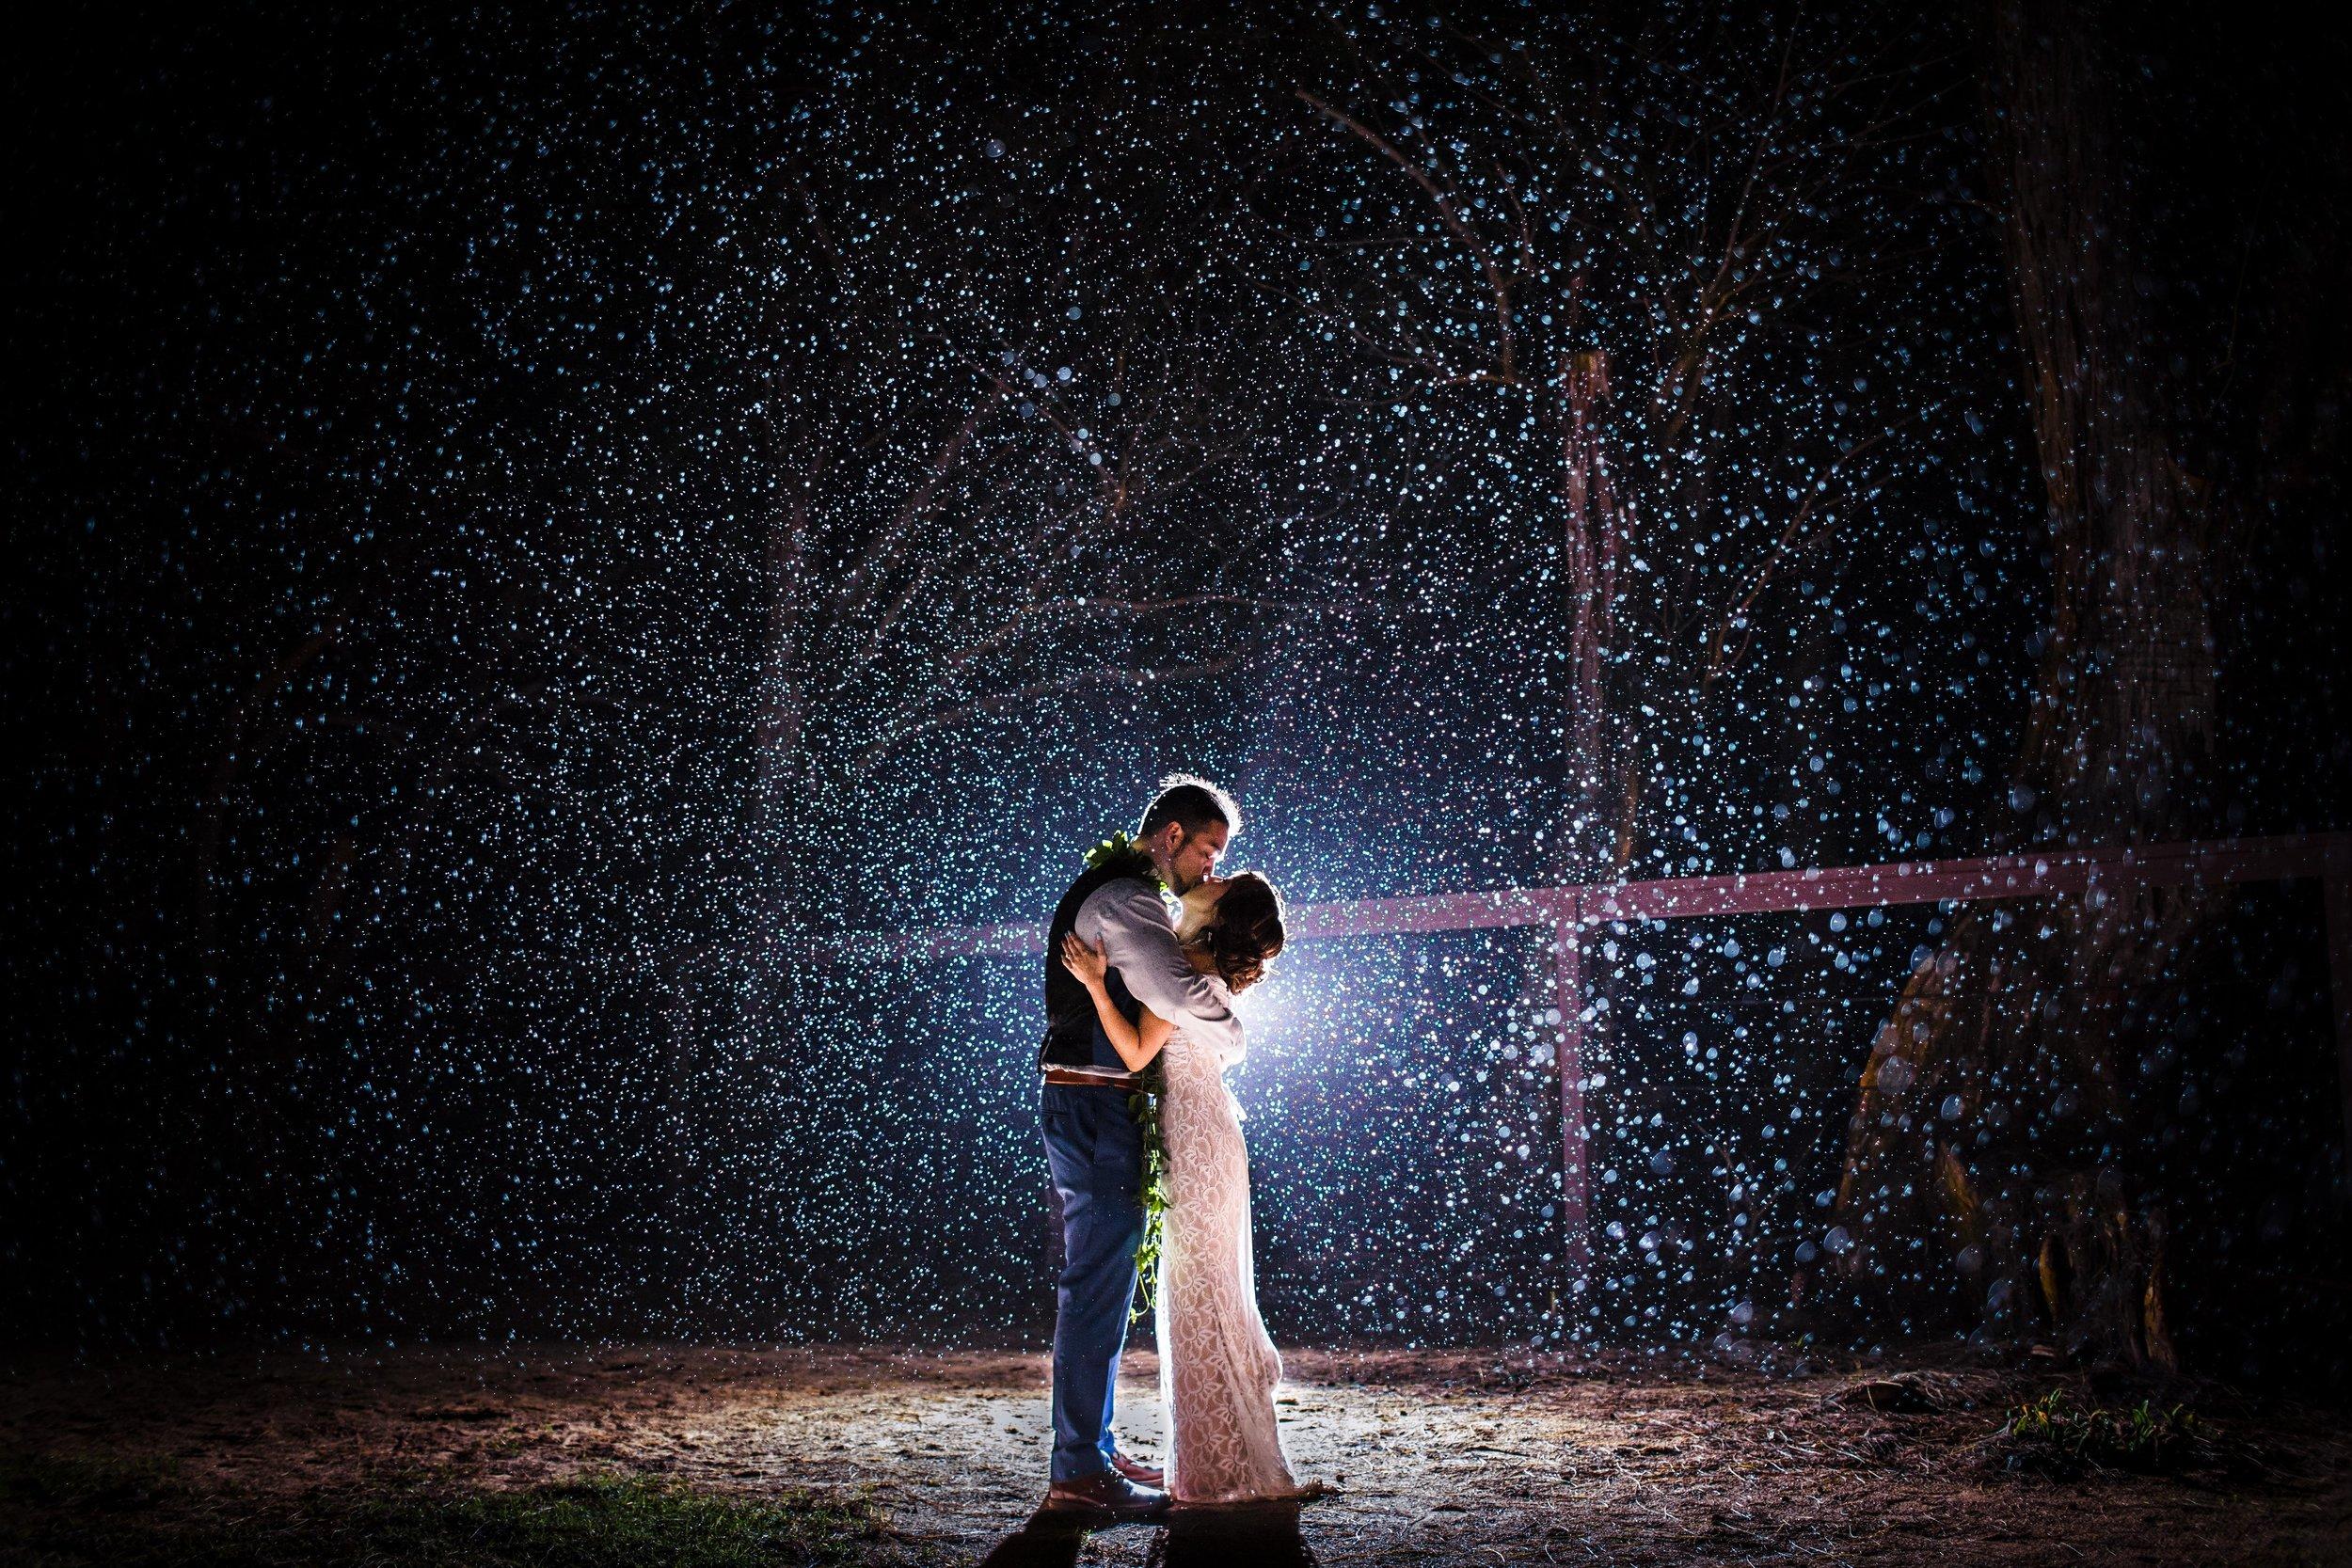 rain-wedding-photo-keoni-michael.jpg